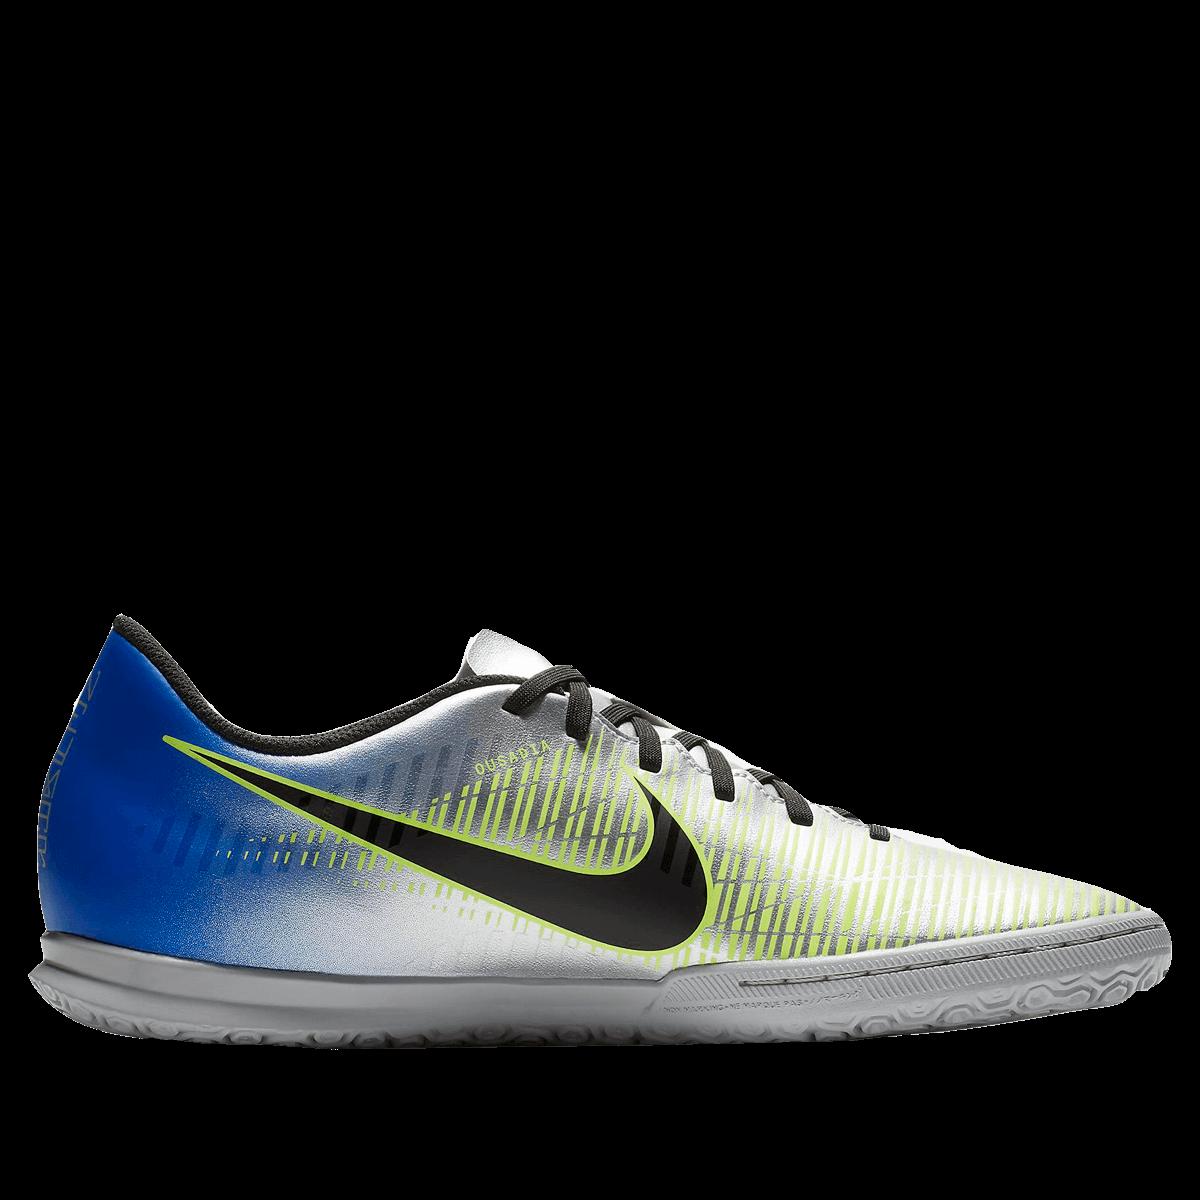 Bizz Store - Chuteira Futsal Nike MercurialX Vortex III Neymar 04c1a8ed7fdac